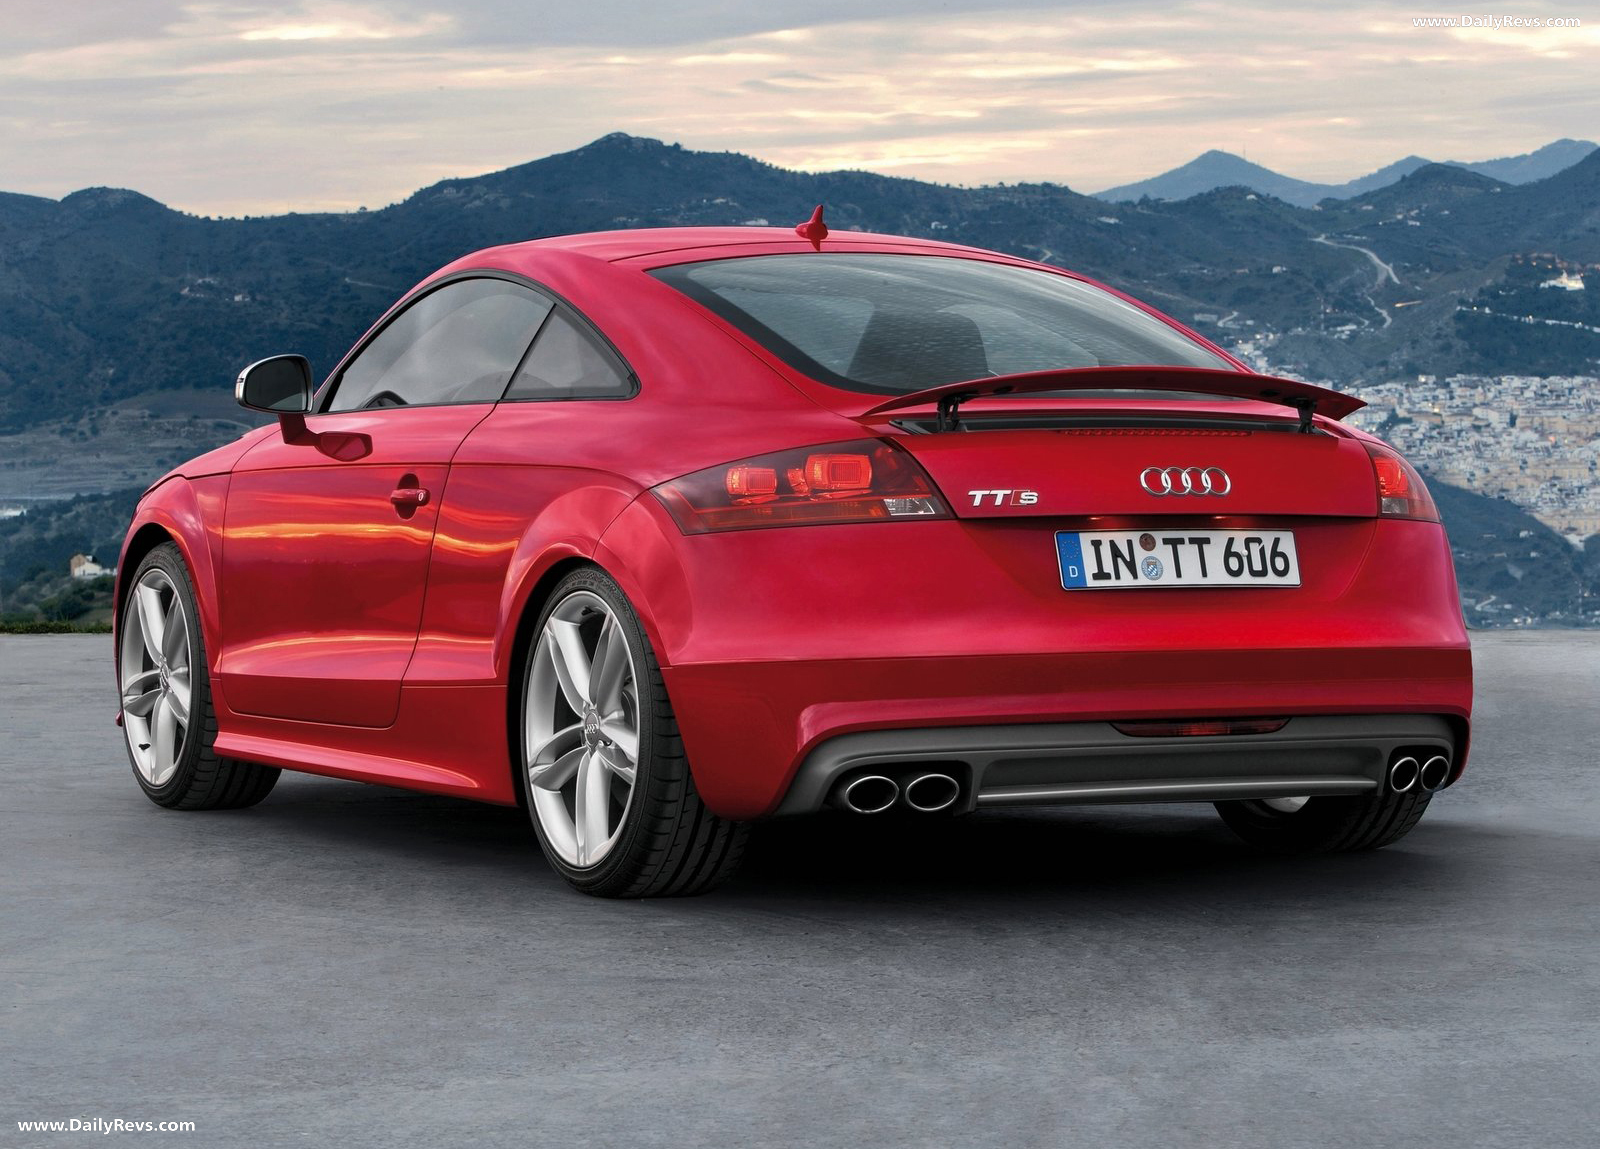 2009 Audi TTS Coupe - HD Pictures, Videos, Specs ...